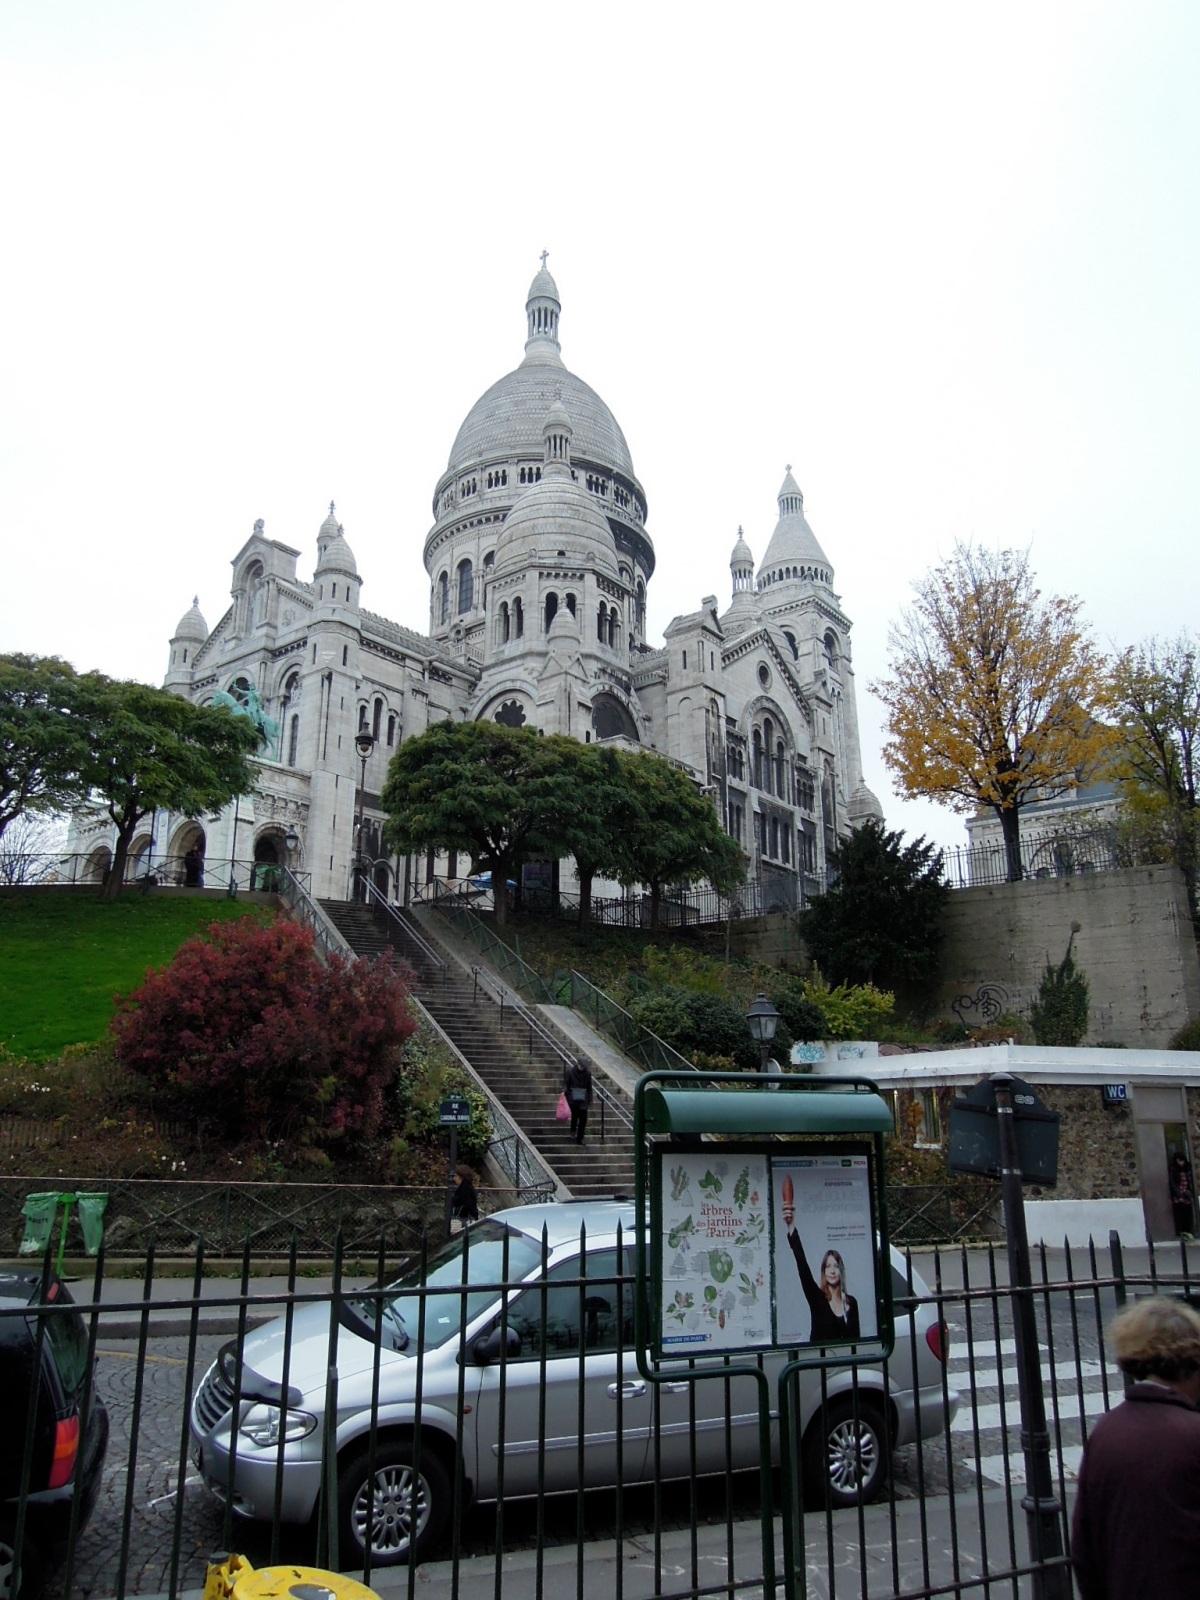 Sacré Coeur Basilica from another angle